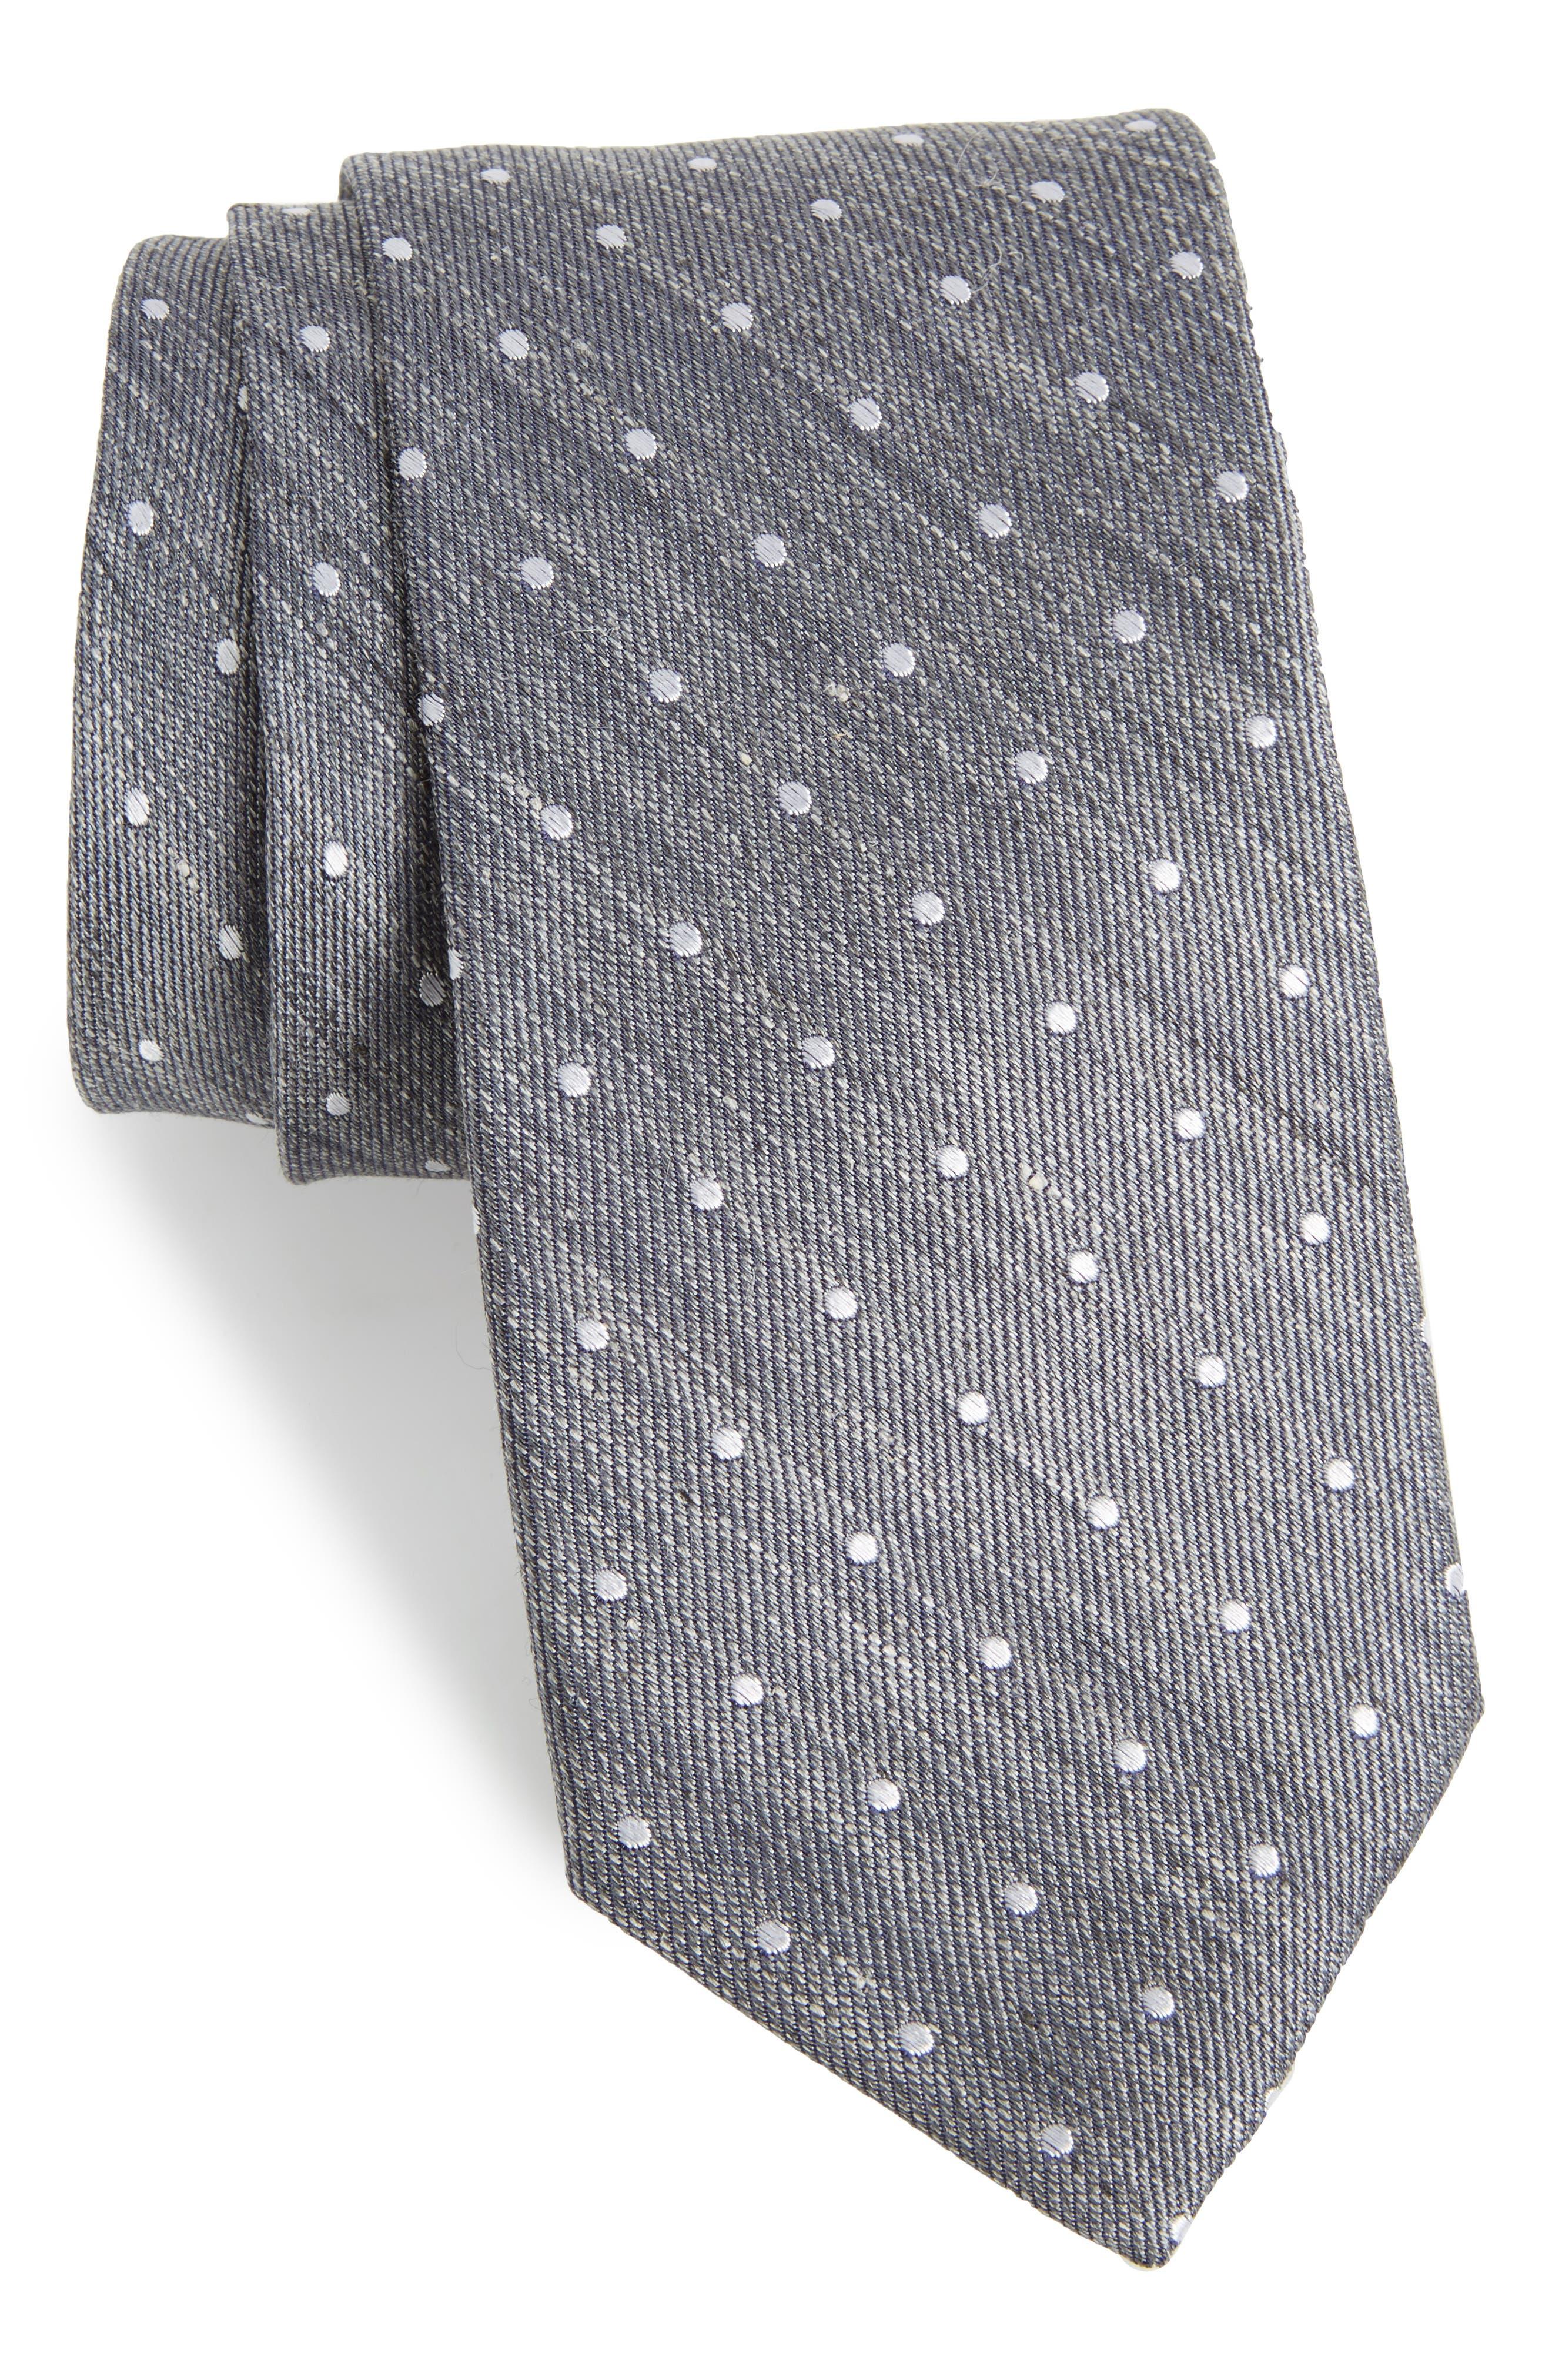 Main Image - Bonobos Dot Silk & Linen Tie